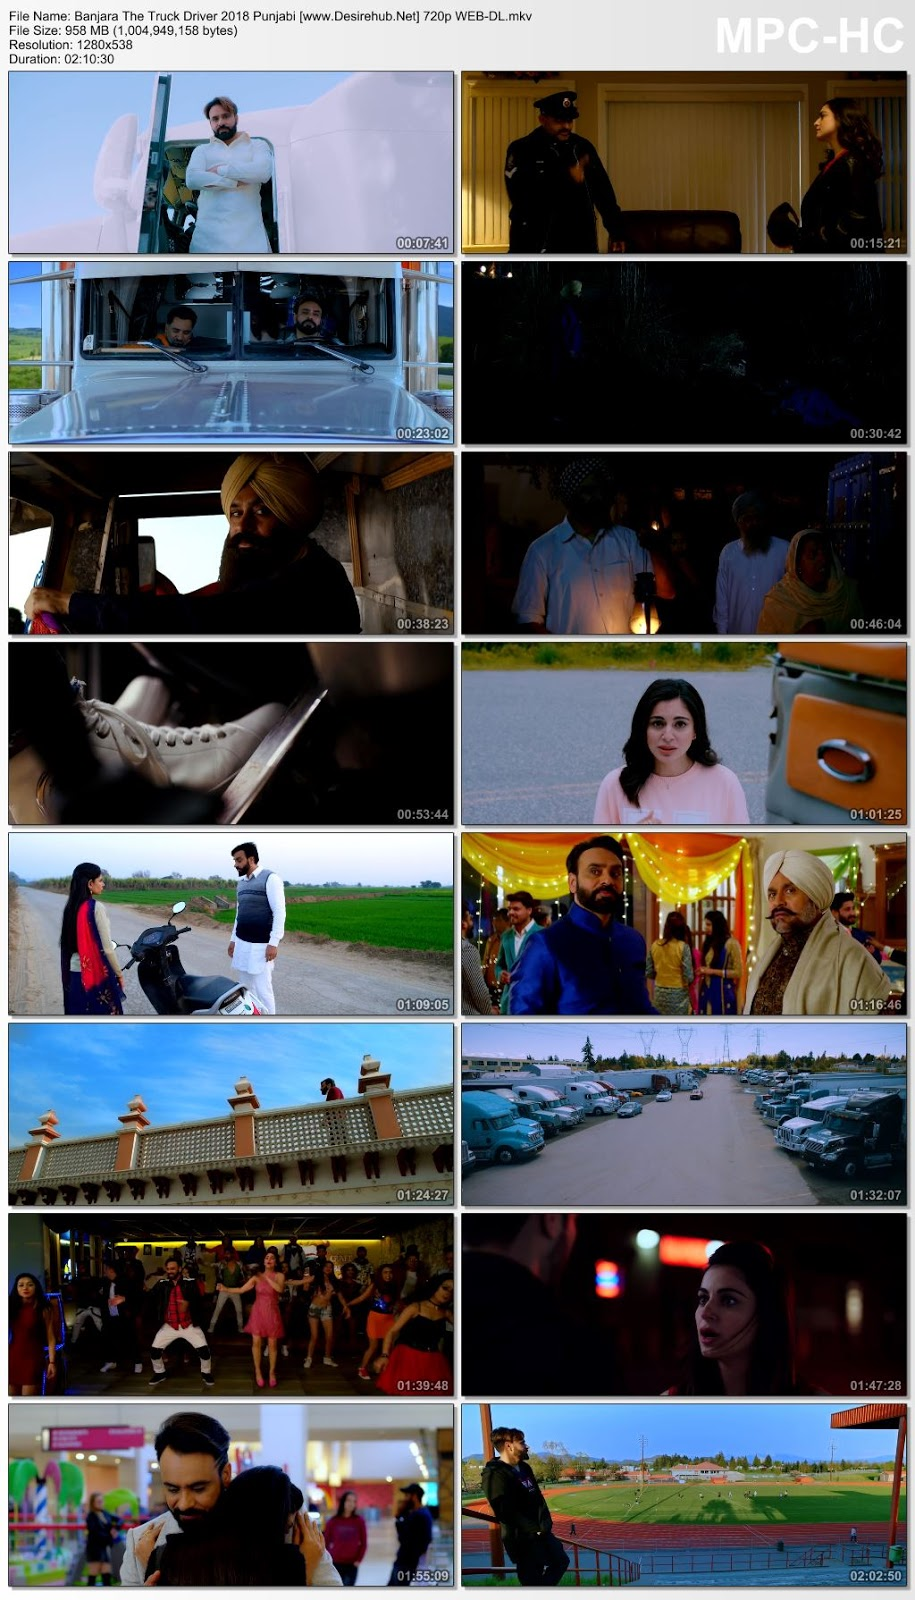 Banjara The Truck Driver 2018 Punjabi 720p WEB-DL – 950MB Desirehub